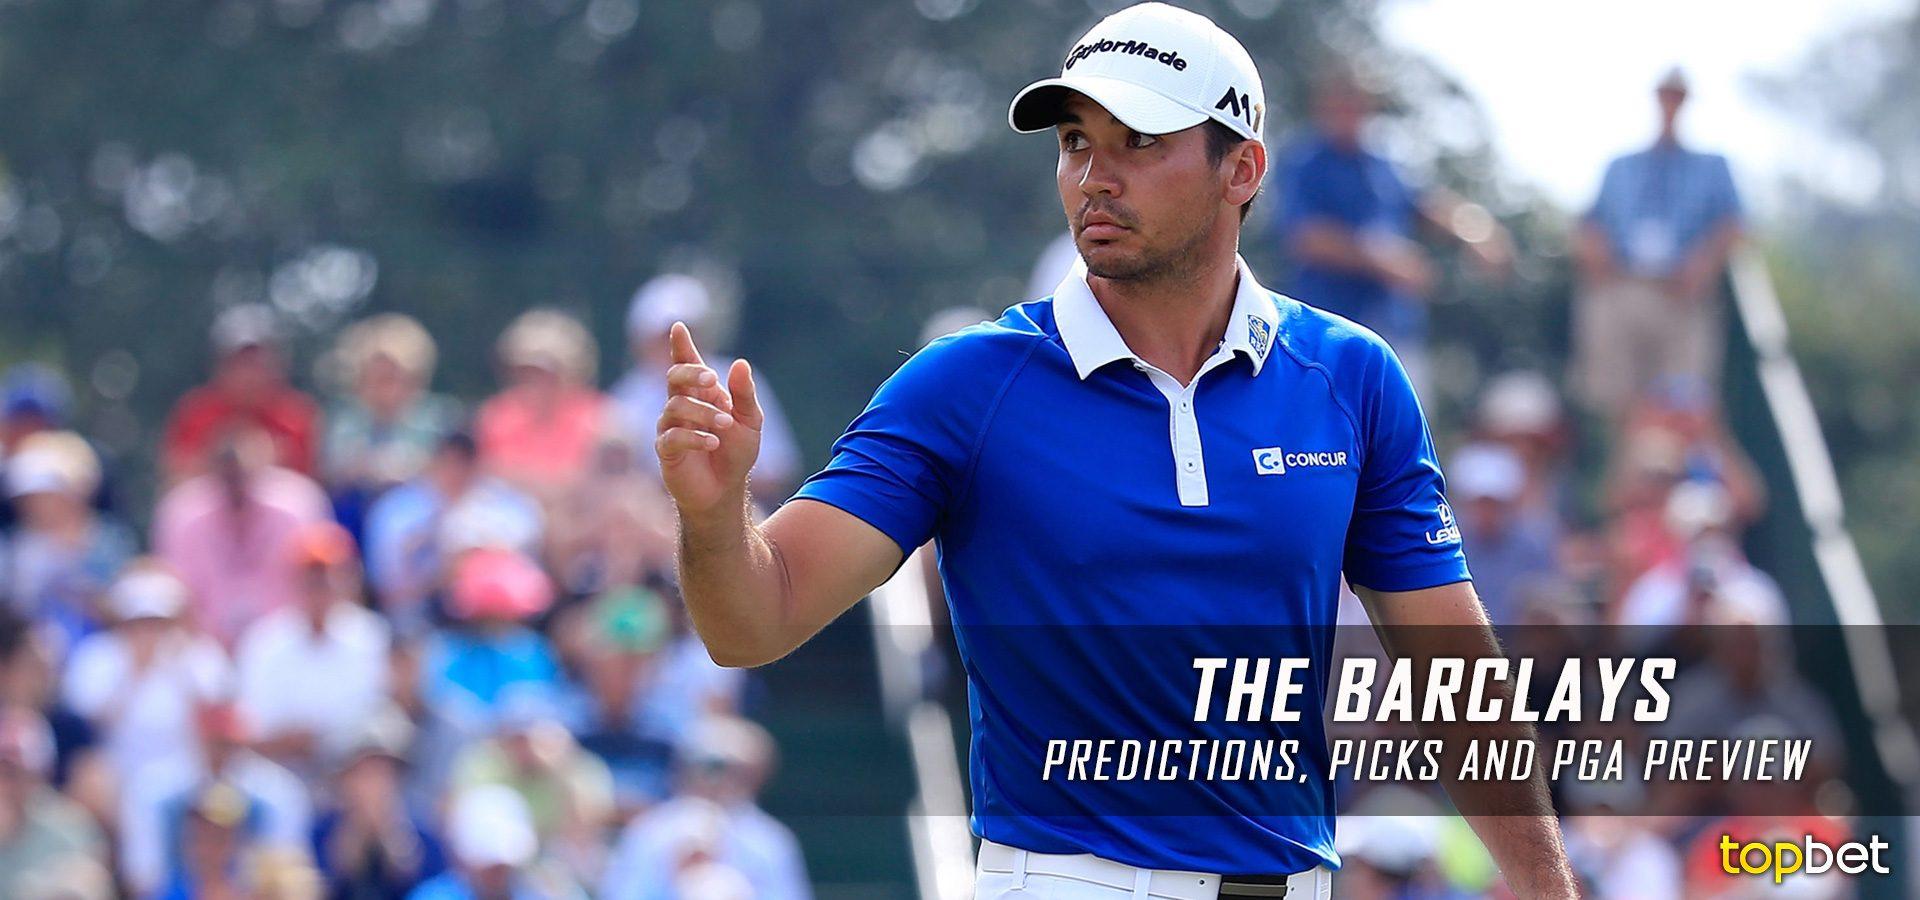 mlb betting advice golf picks this week